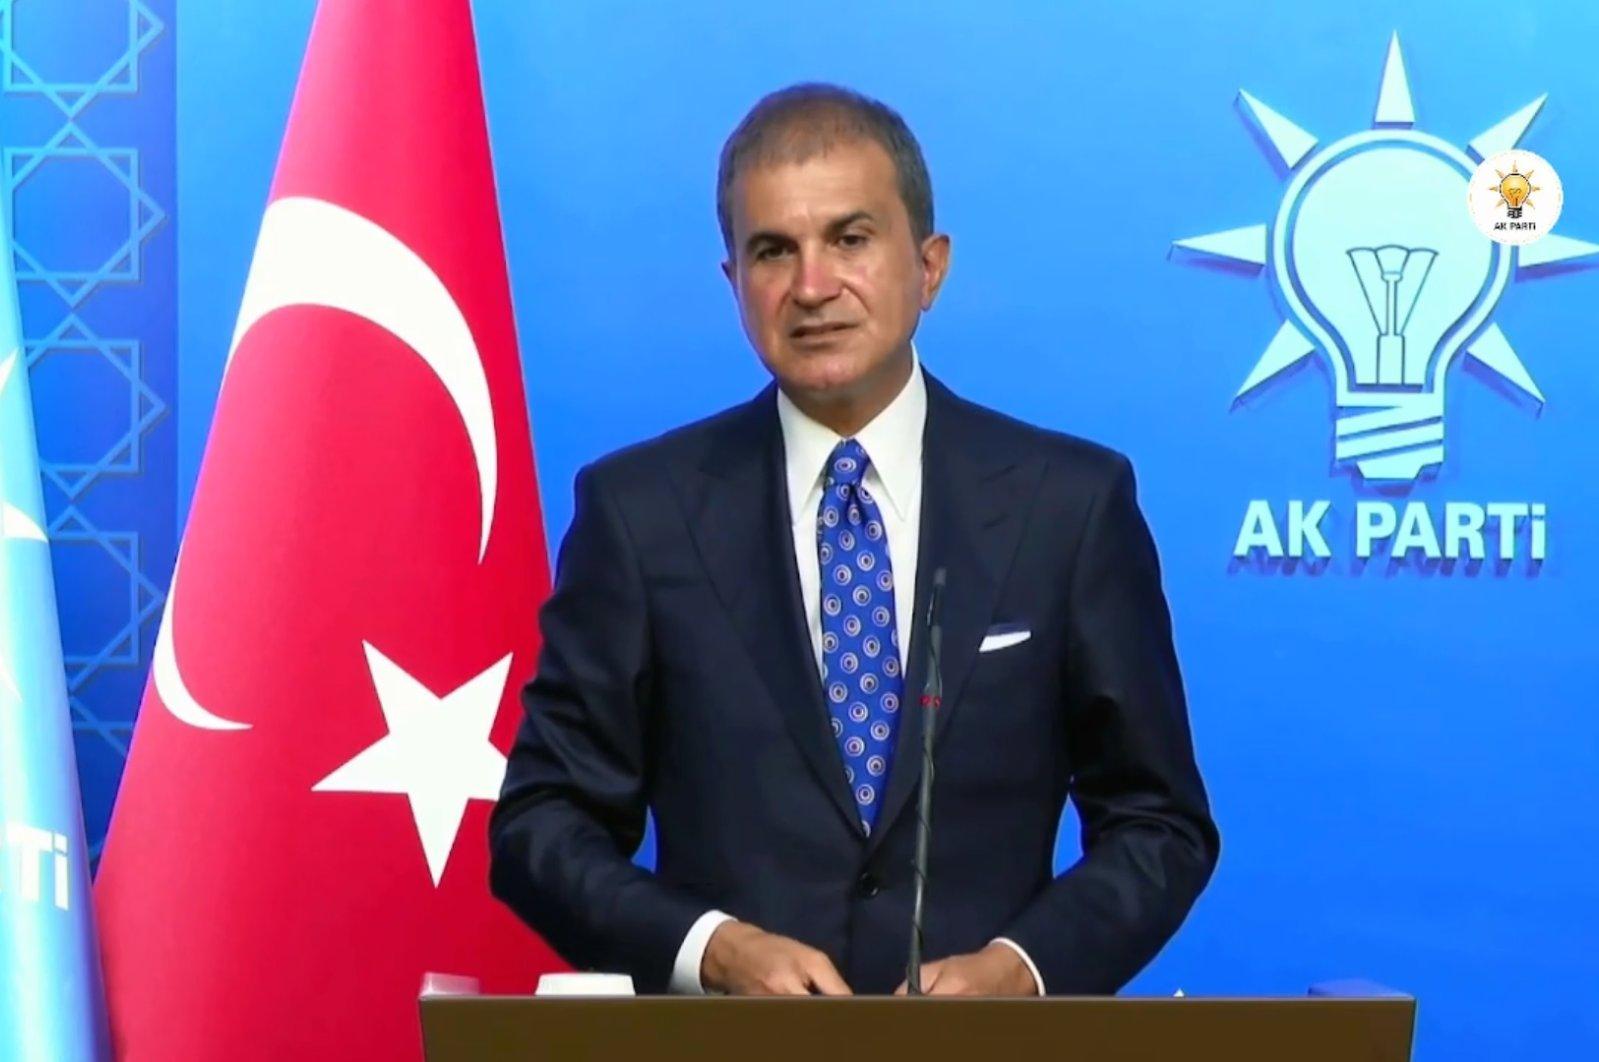 AK Party spokesperson Ömer Çelik speaks at a news conference in Ankara, Turkey, Aug. 23, 2021. (DHA Photo)